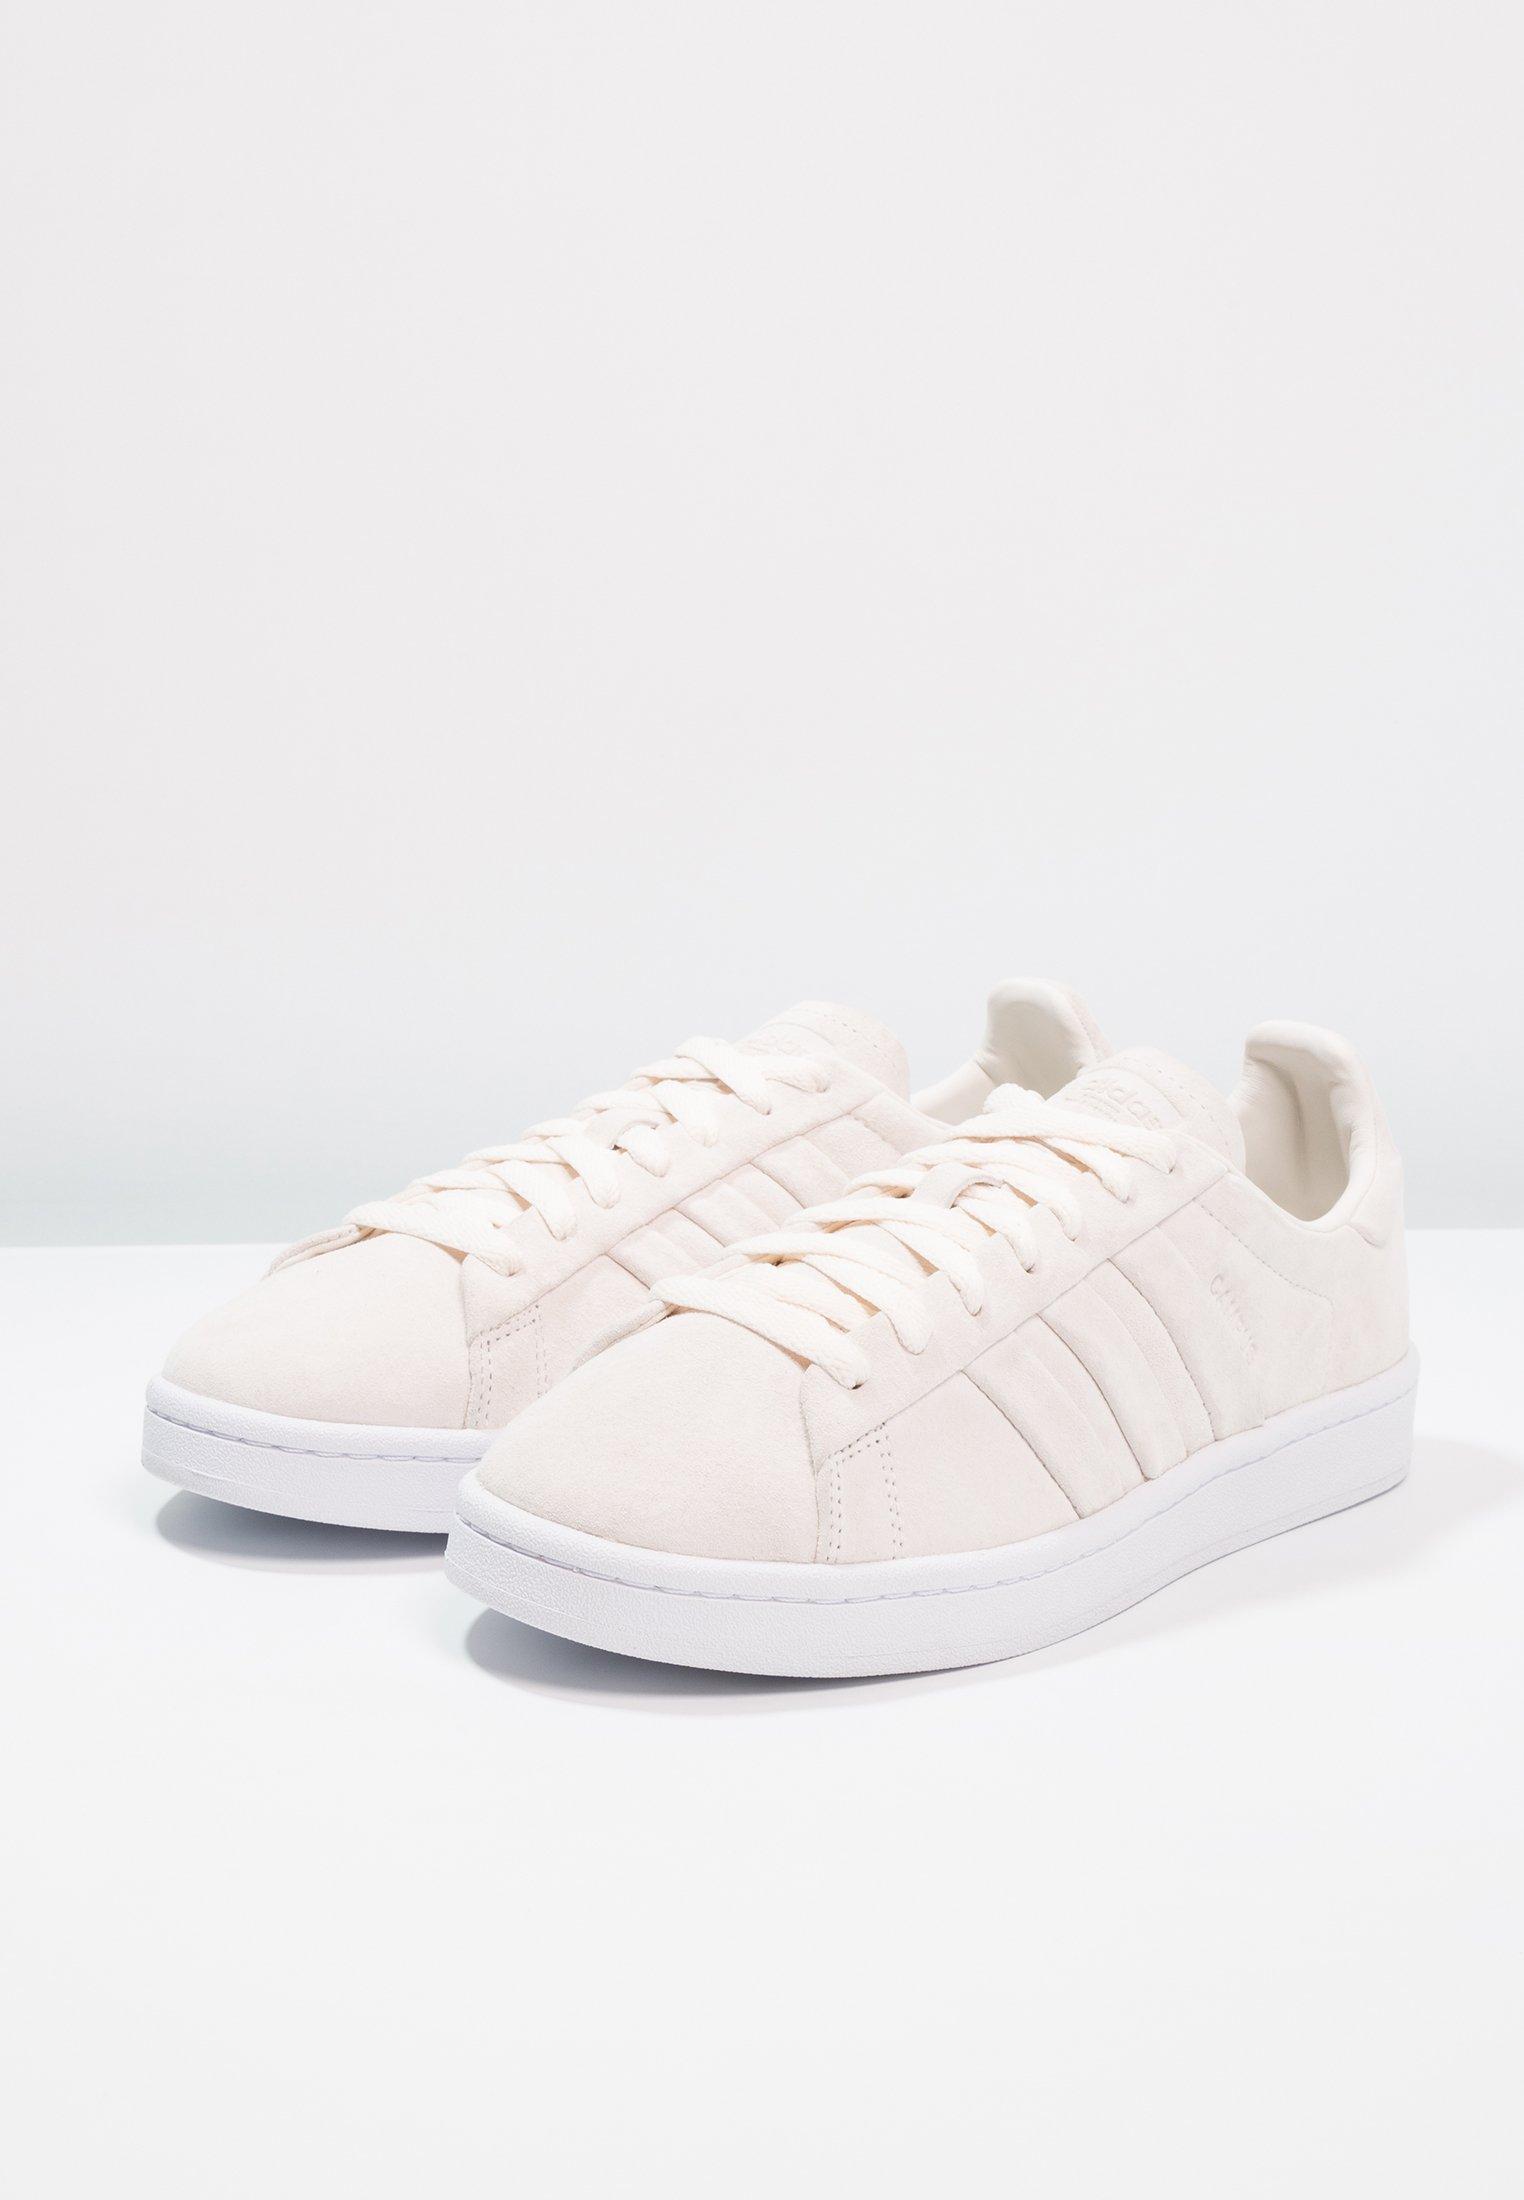 Chalk White Campus TurnBaskets Adidas White Stitch And Originals footwear Basses kiTPZOXu